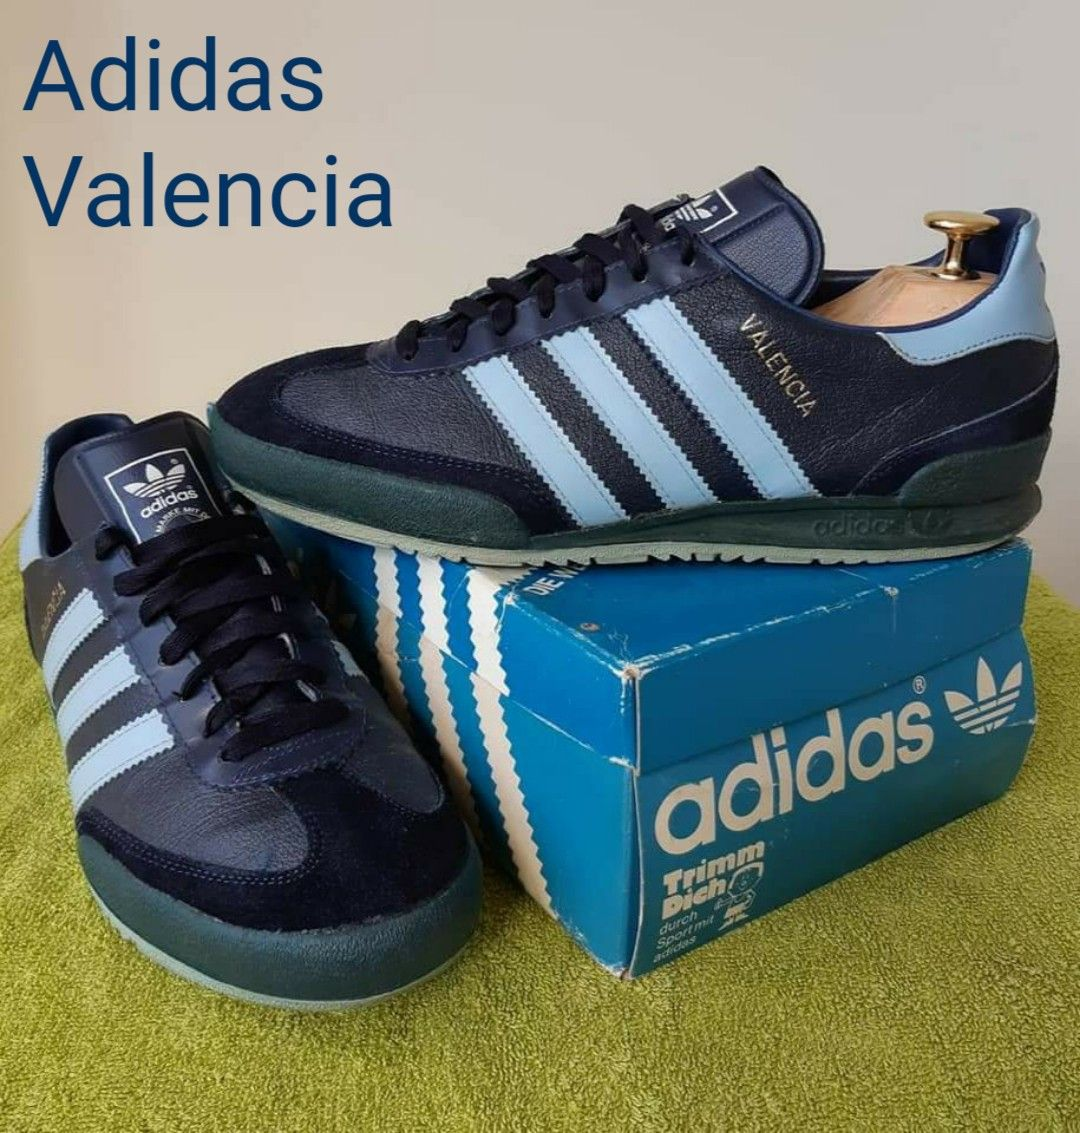 ADIDAS BECKENBAUER ALLROUND Retro Schwarz Sneaker EU 43 13